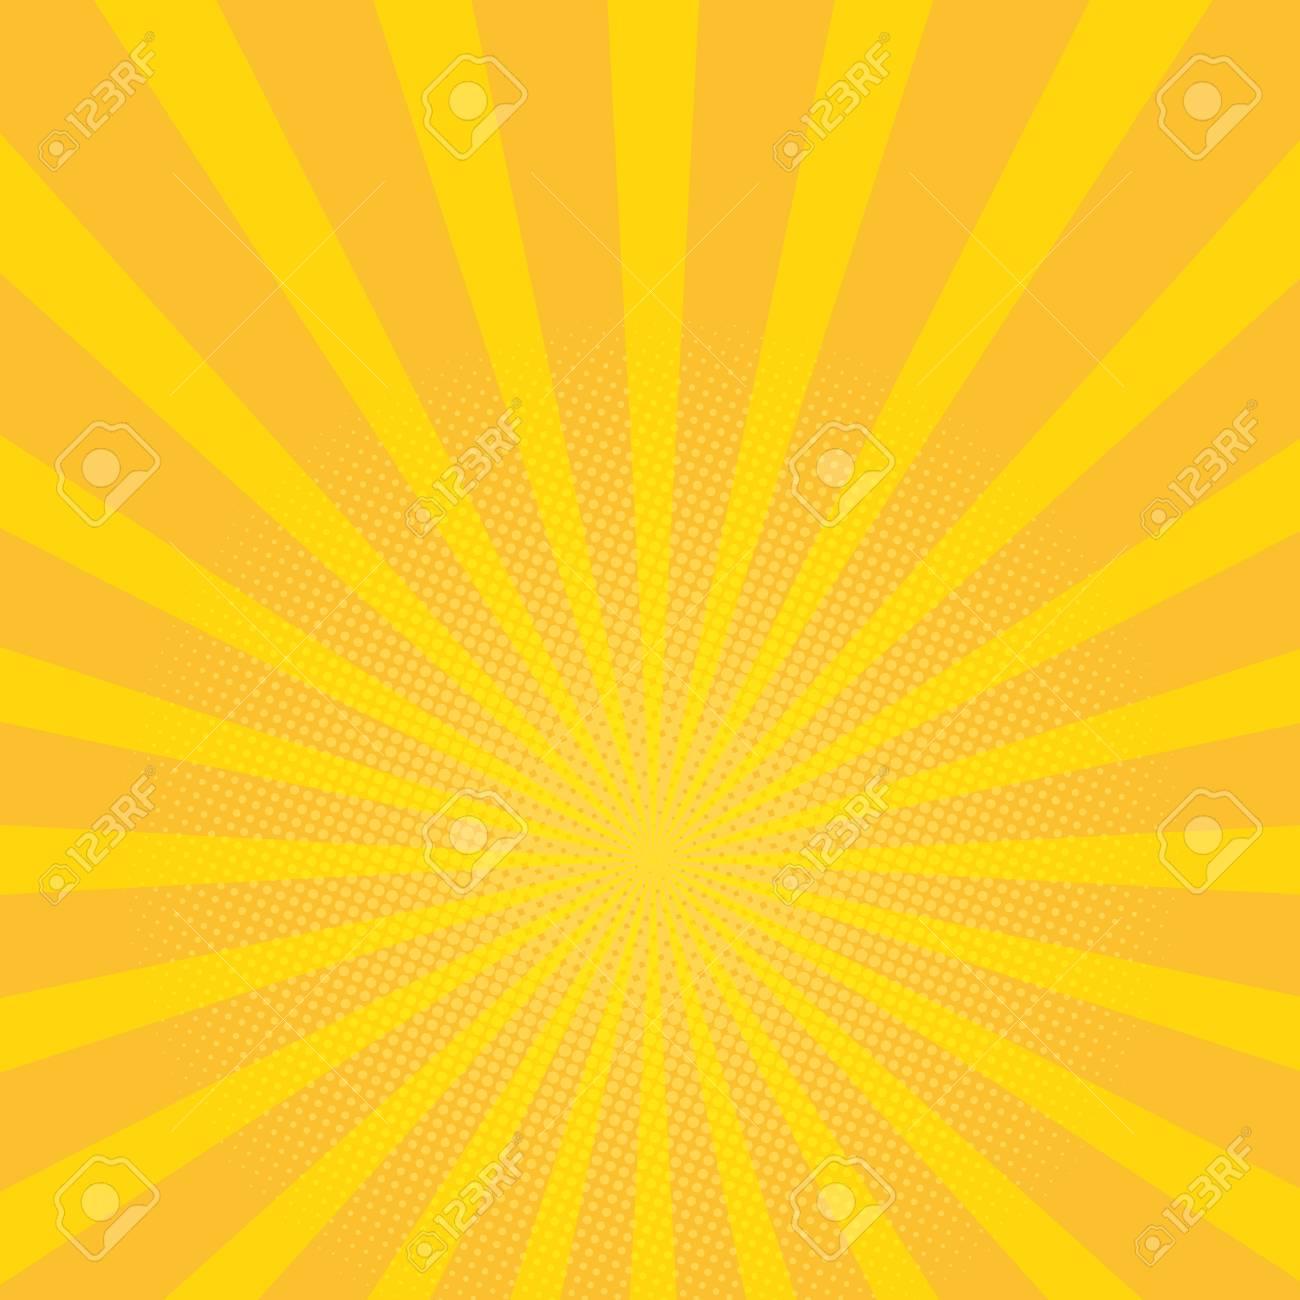 70fb02cdd7a80 Beautiful summer sunburst background. yellow rays pop art background. retro  illustration. Sun rays